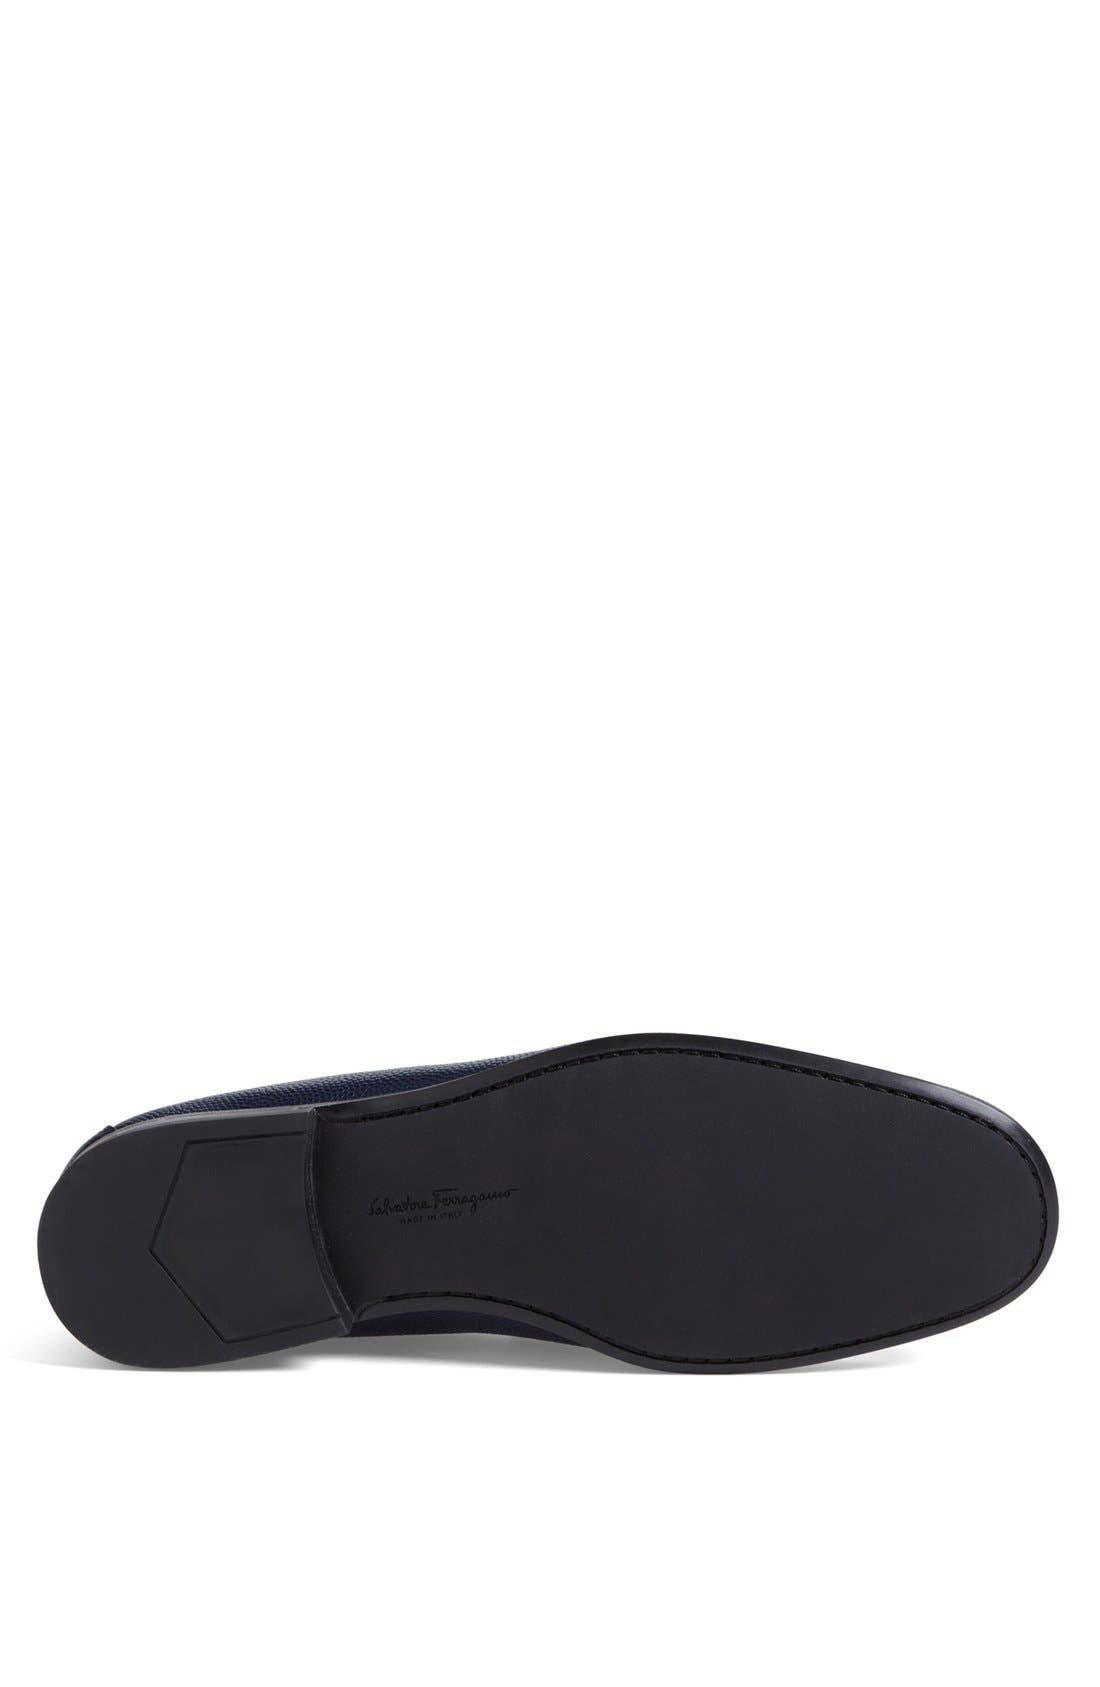 Alternate Image 4  - Salvatore Ferragamo 'Regal' Pebbled Leather Loafer